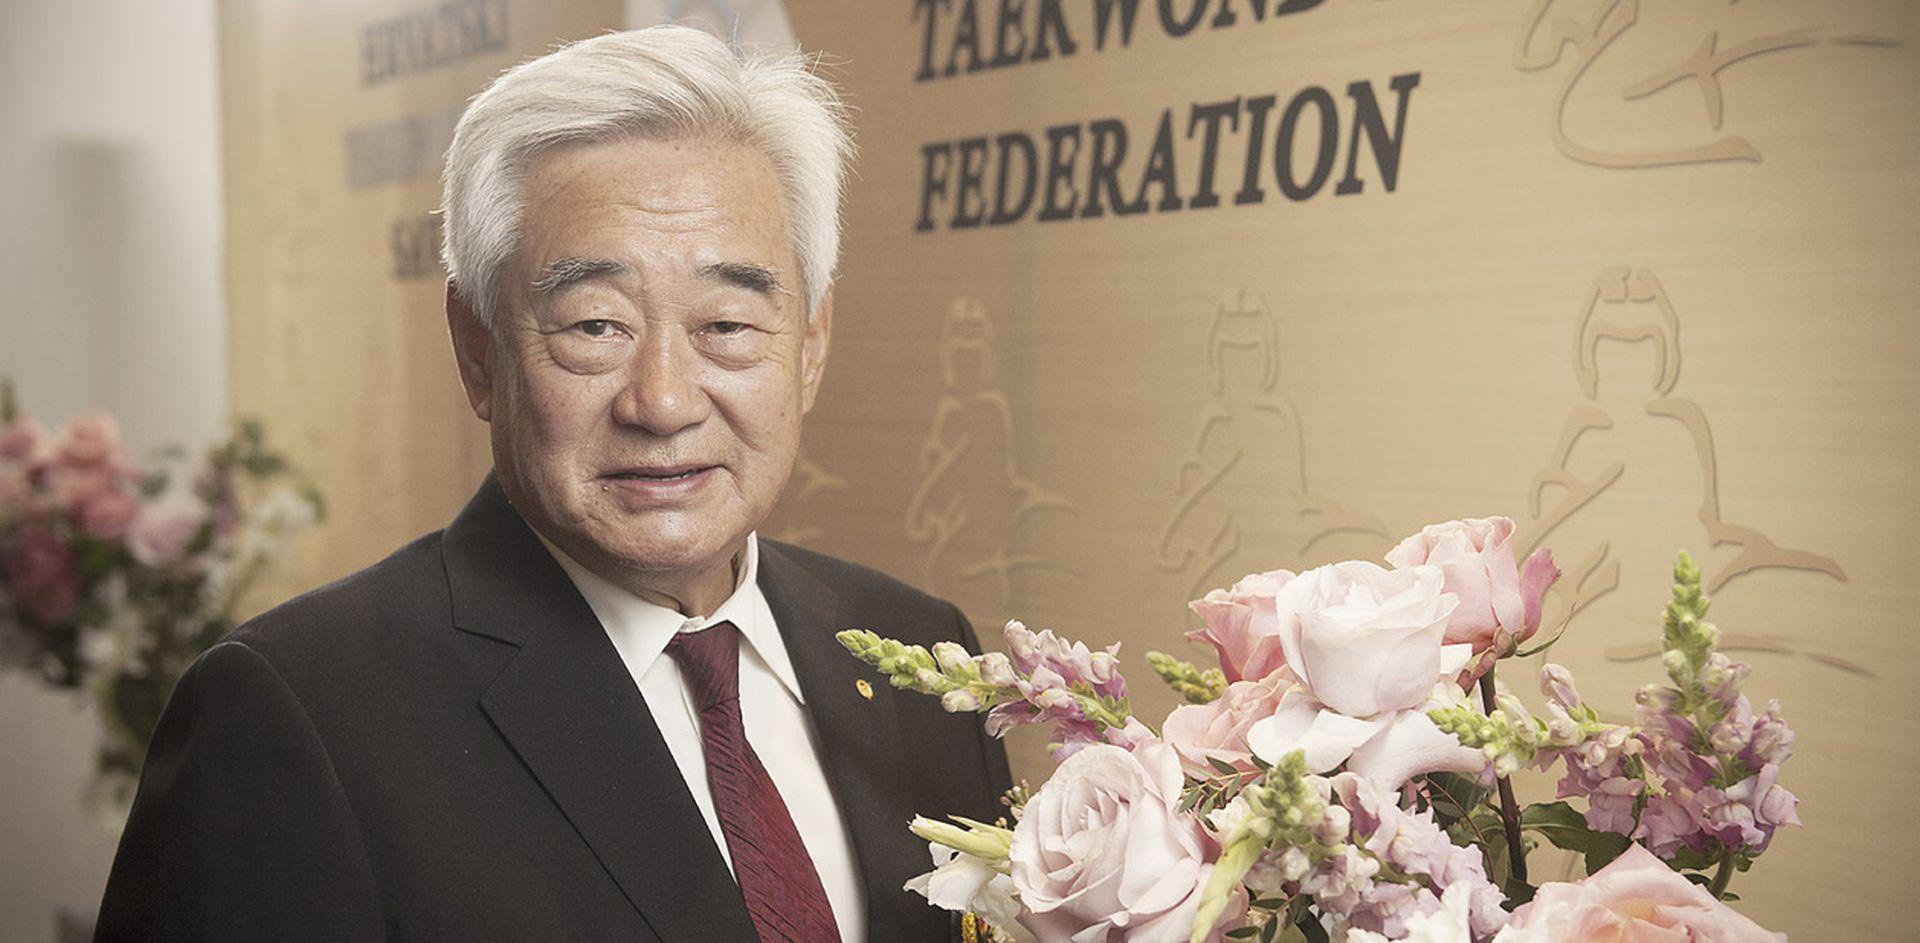 'Taekwondo je uspio spojiti sportaše Južne i Sjeverne Koreje'